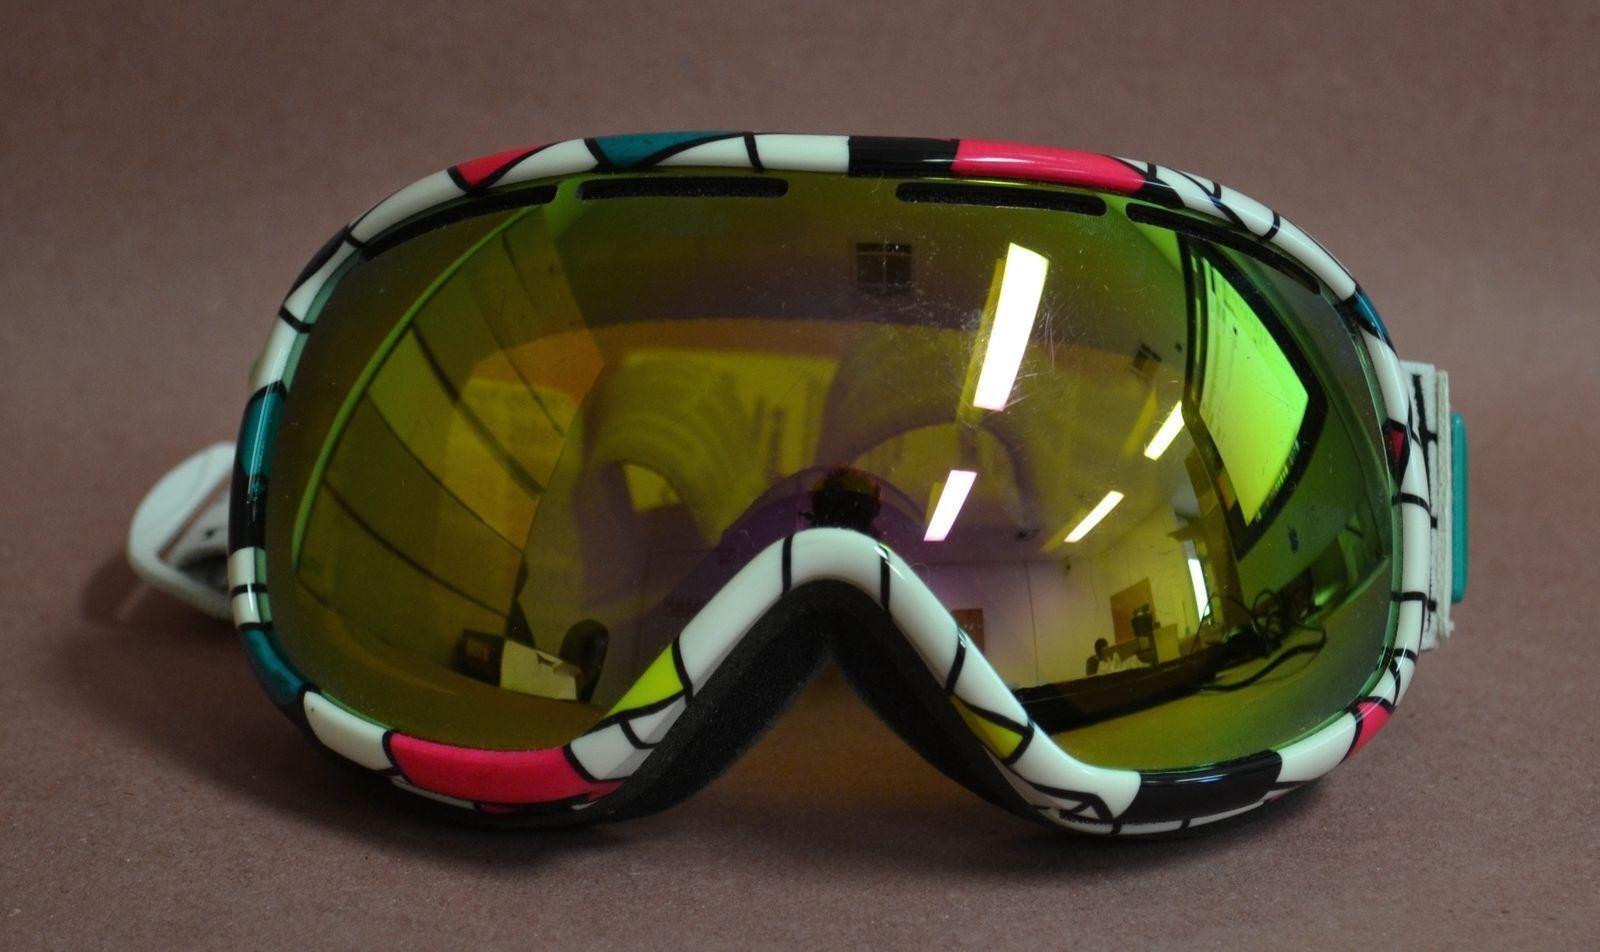 Von Von Von Zipper Coastal Edge Chaka Google Mop Multi-Color Ski Occhiali 226120 ccc614